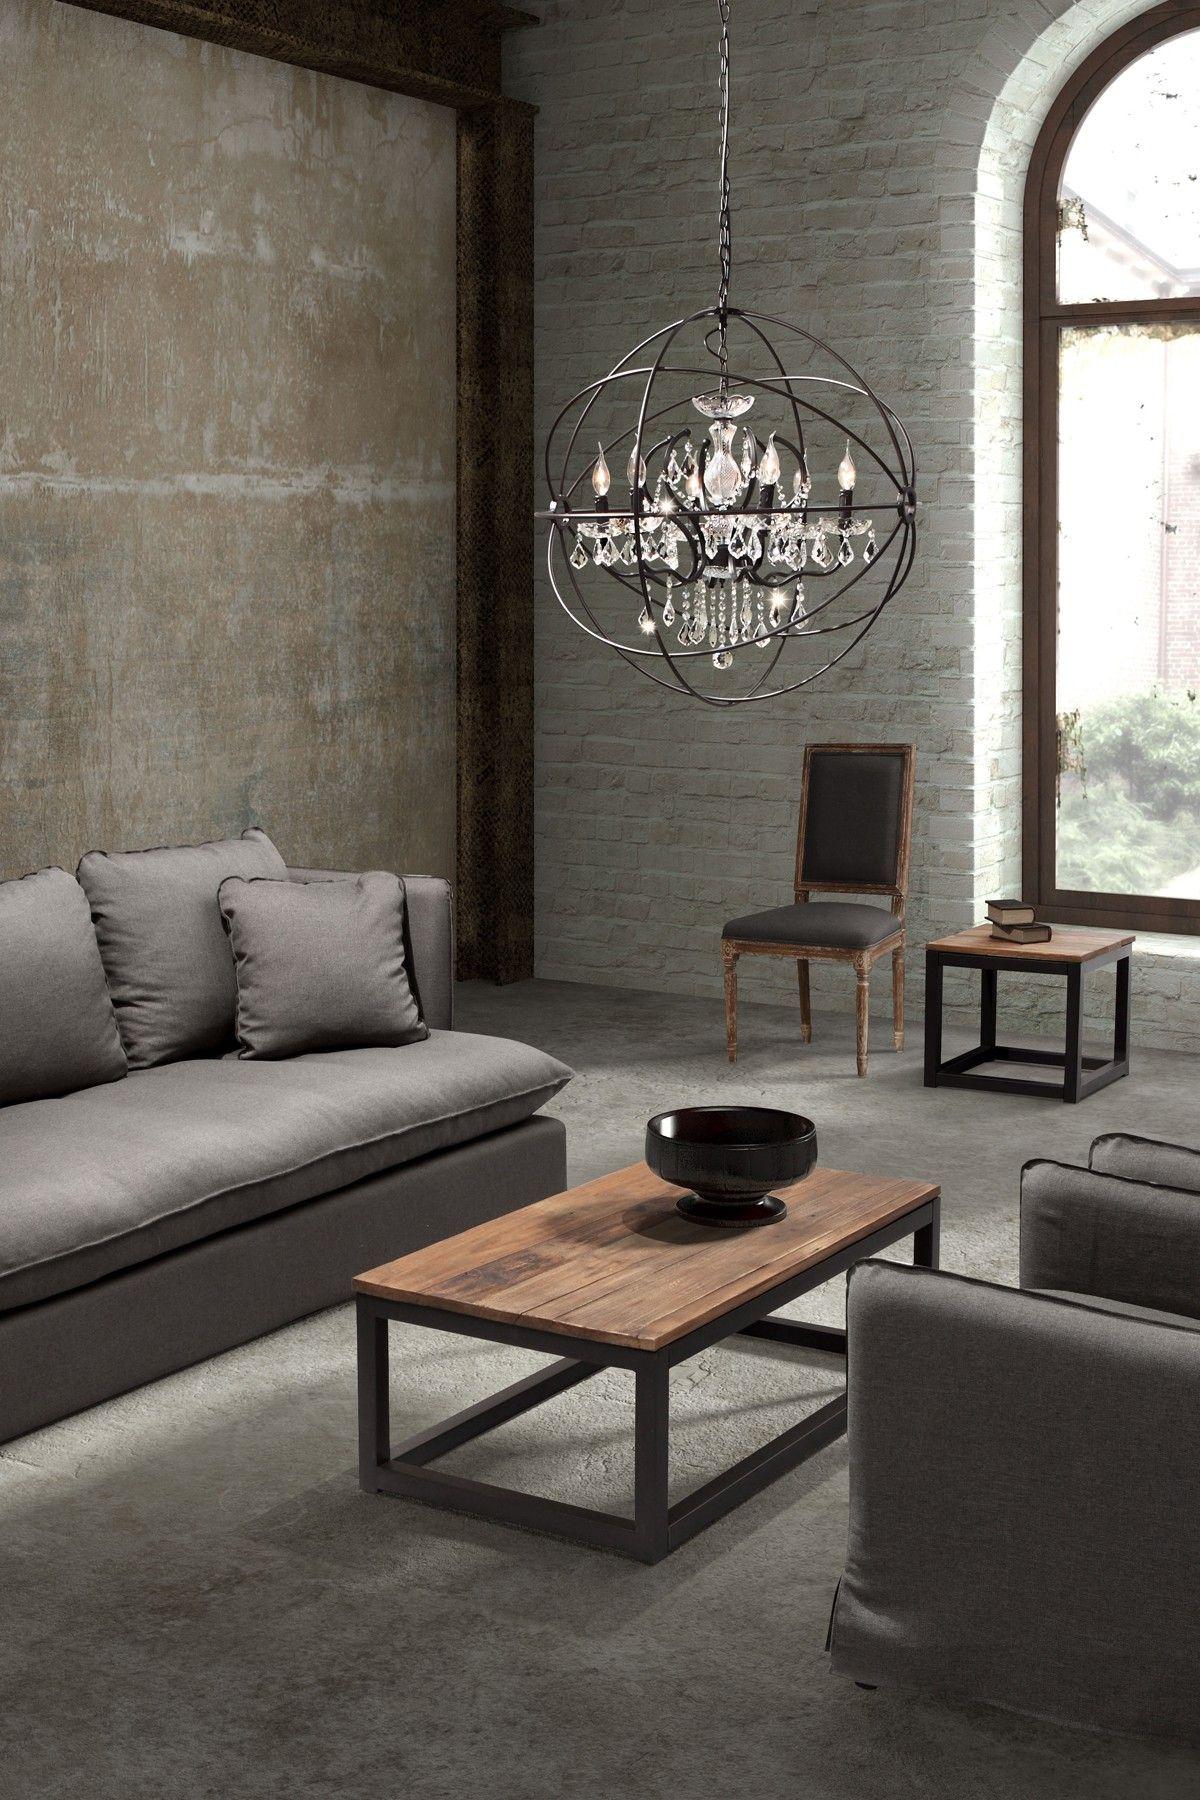 Industrie Moebel Wohndesign Trends 2015 Frankreich